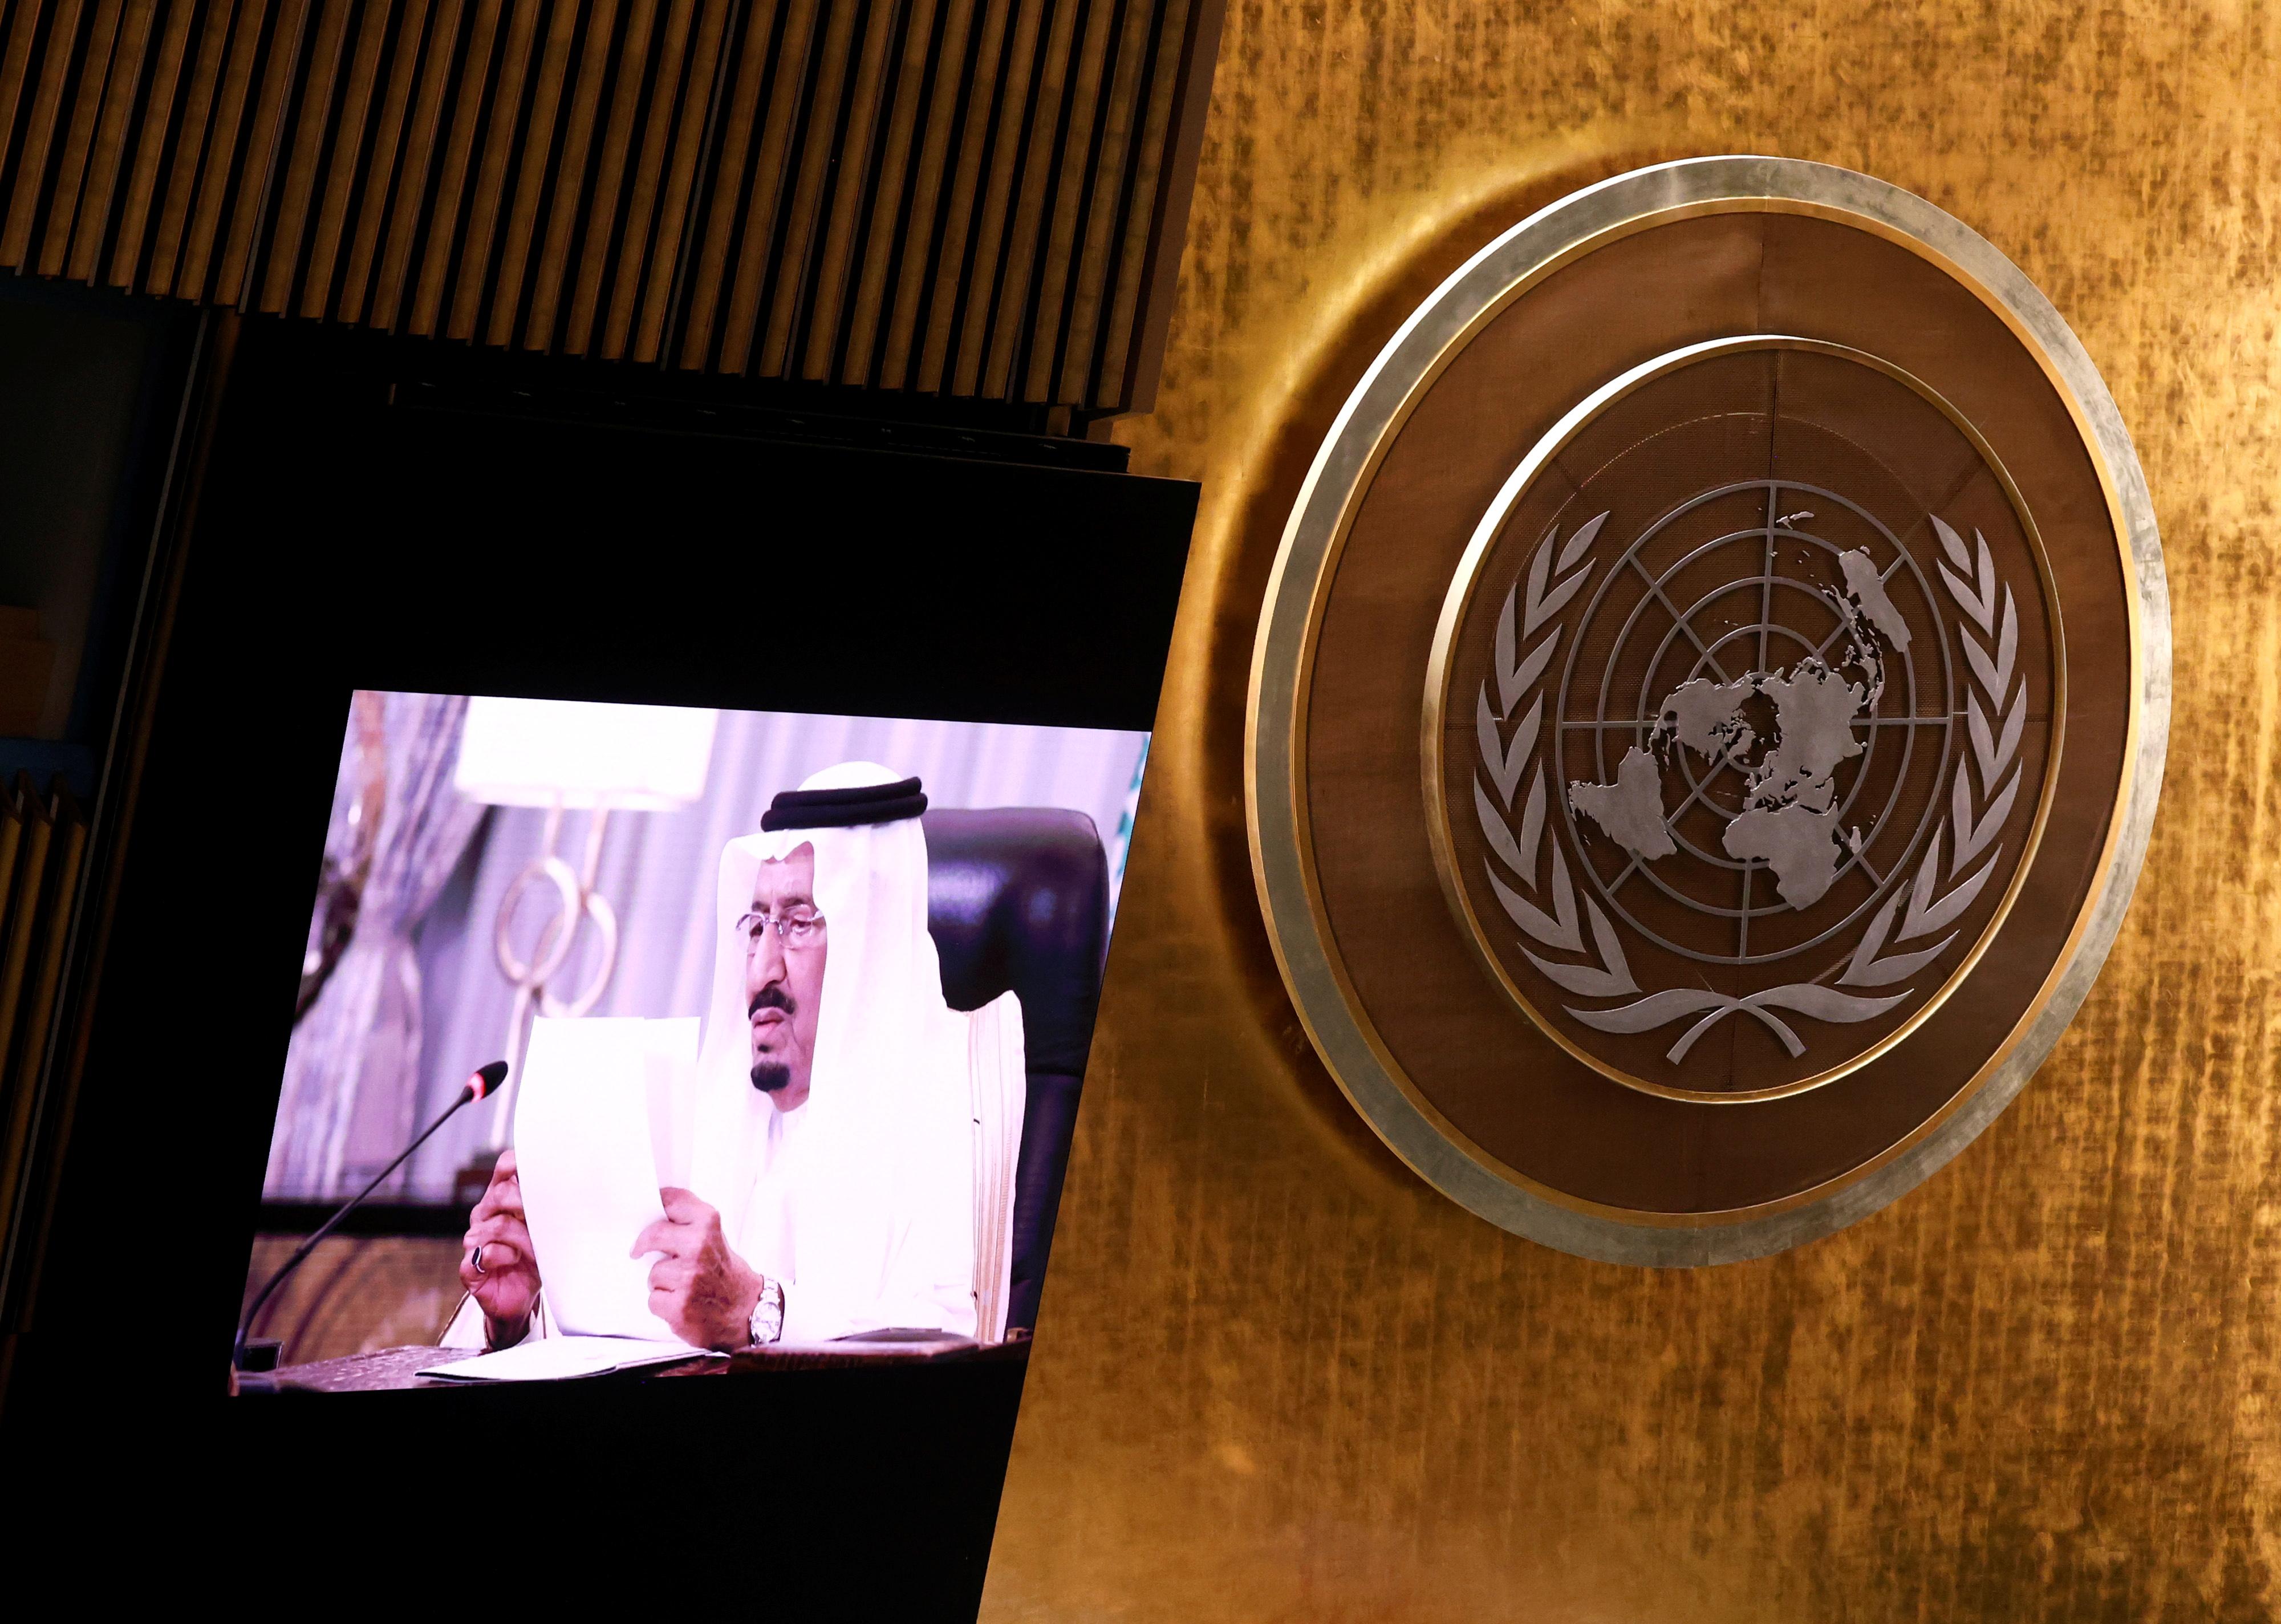 Saudi King Salman bin Abdulaziz addresses, via a prerecorded statement, the General Debate of the 76th Session of the United Nations General Assembly in New York City, U.S., September 22, 2021. John Angelillo/Pool via REUTERS